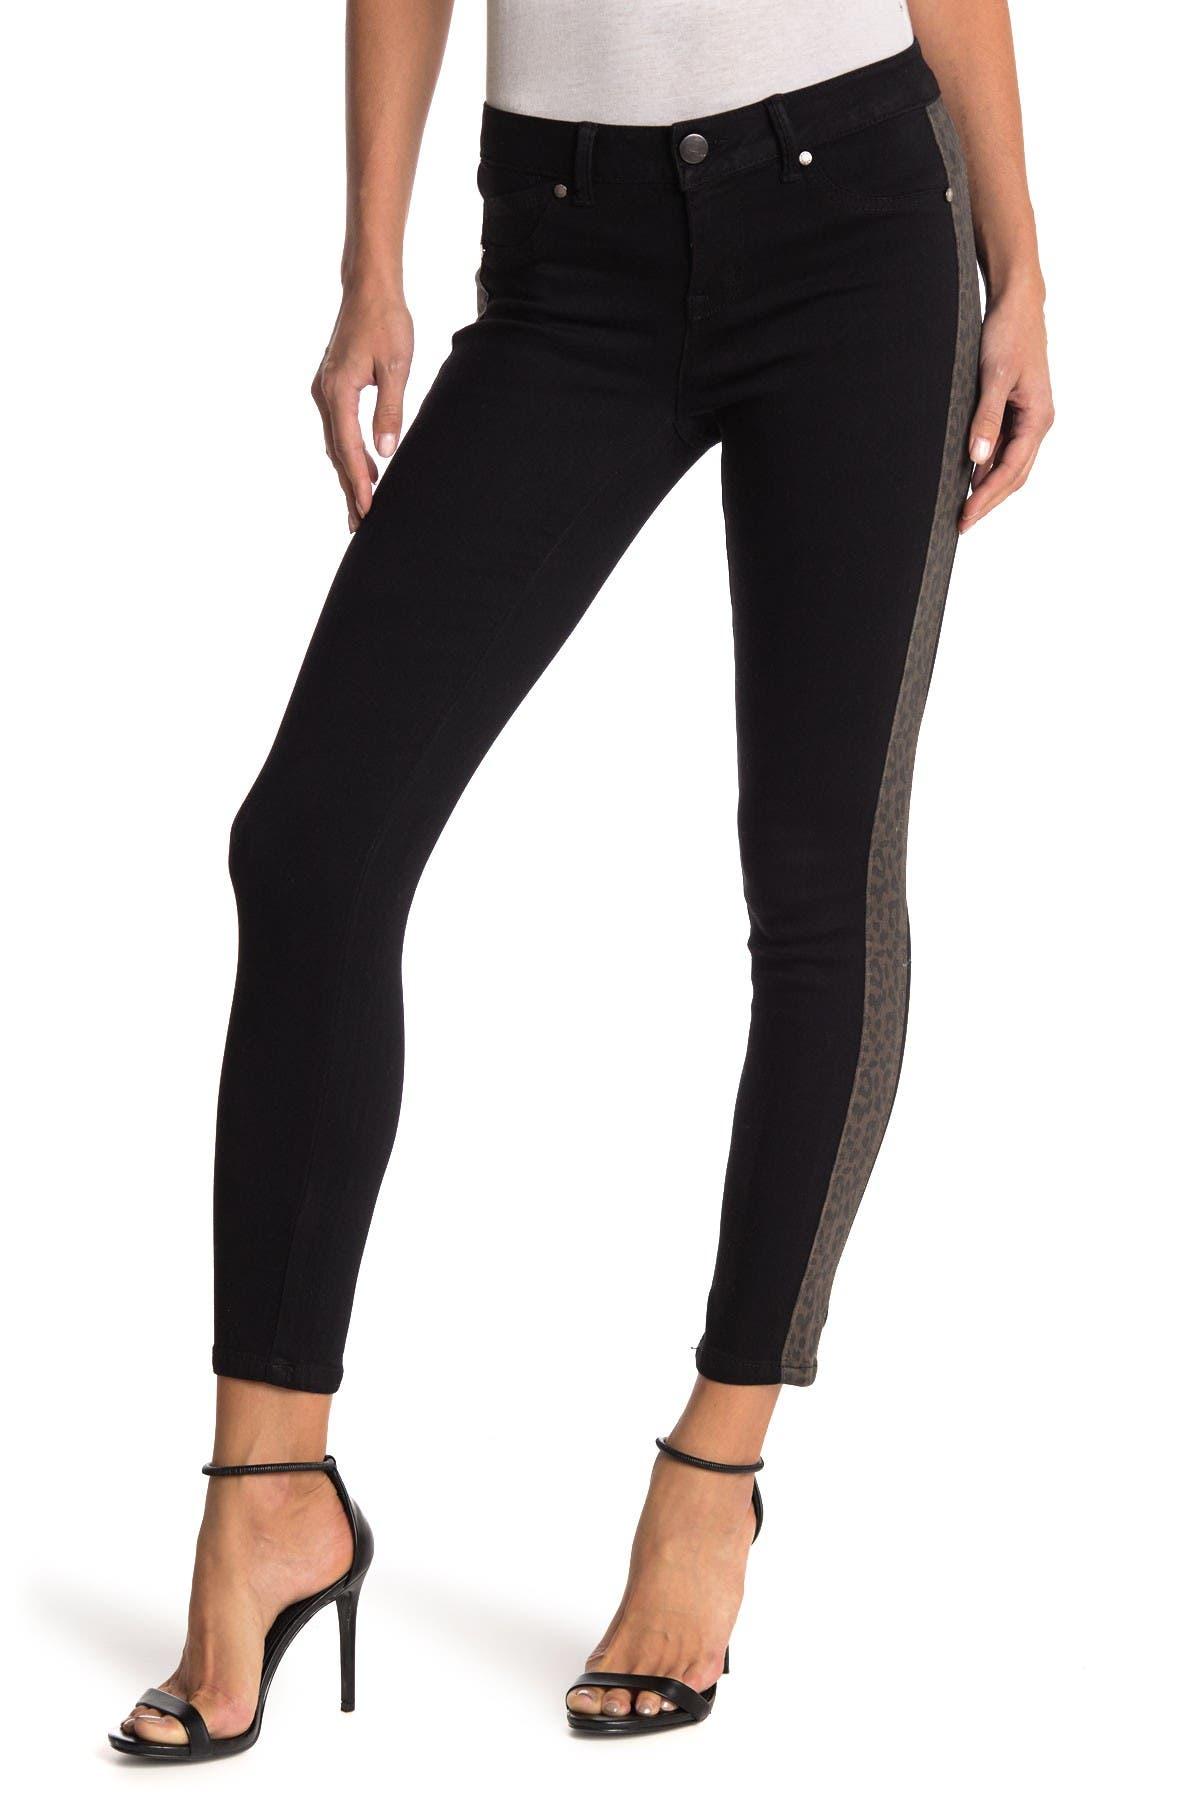 Image of 1822 Denim Cheetah Side Stripe Black Contour Jeans